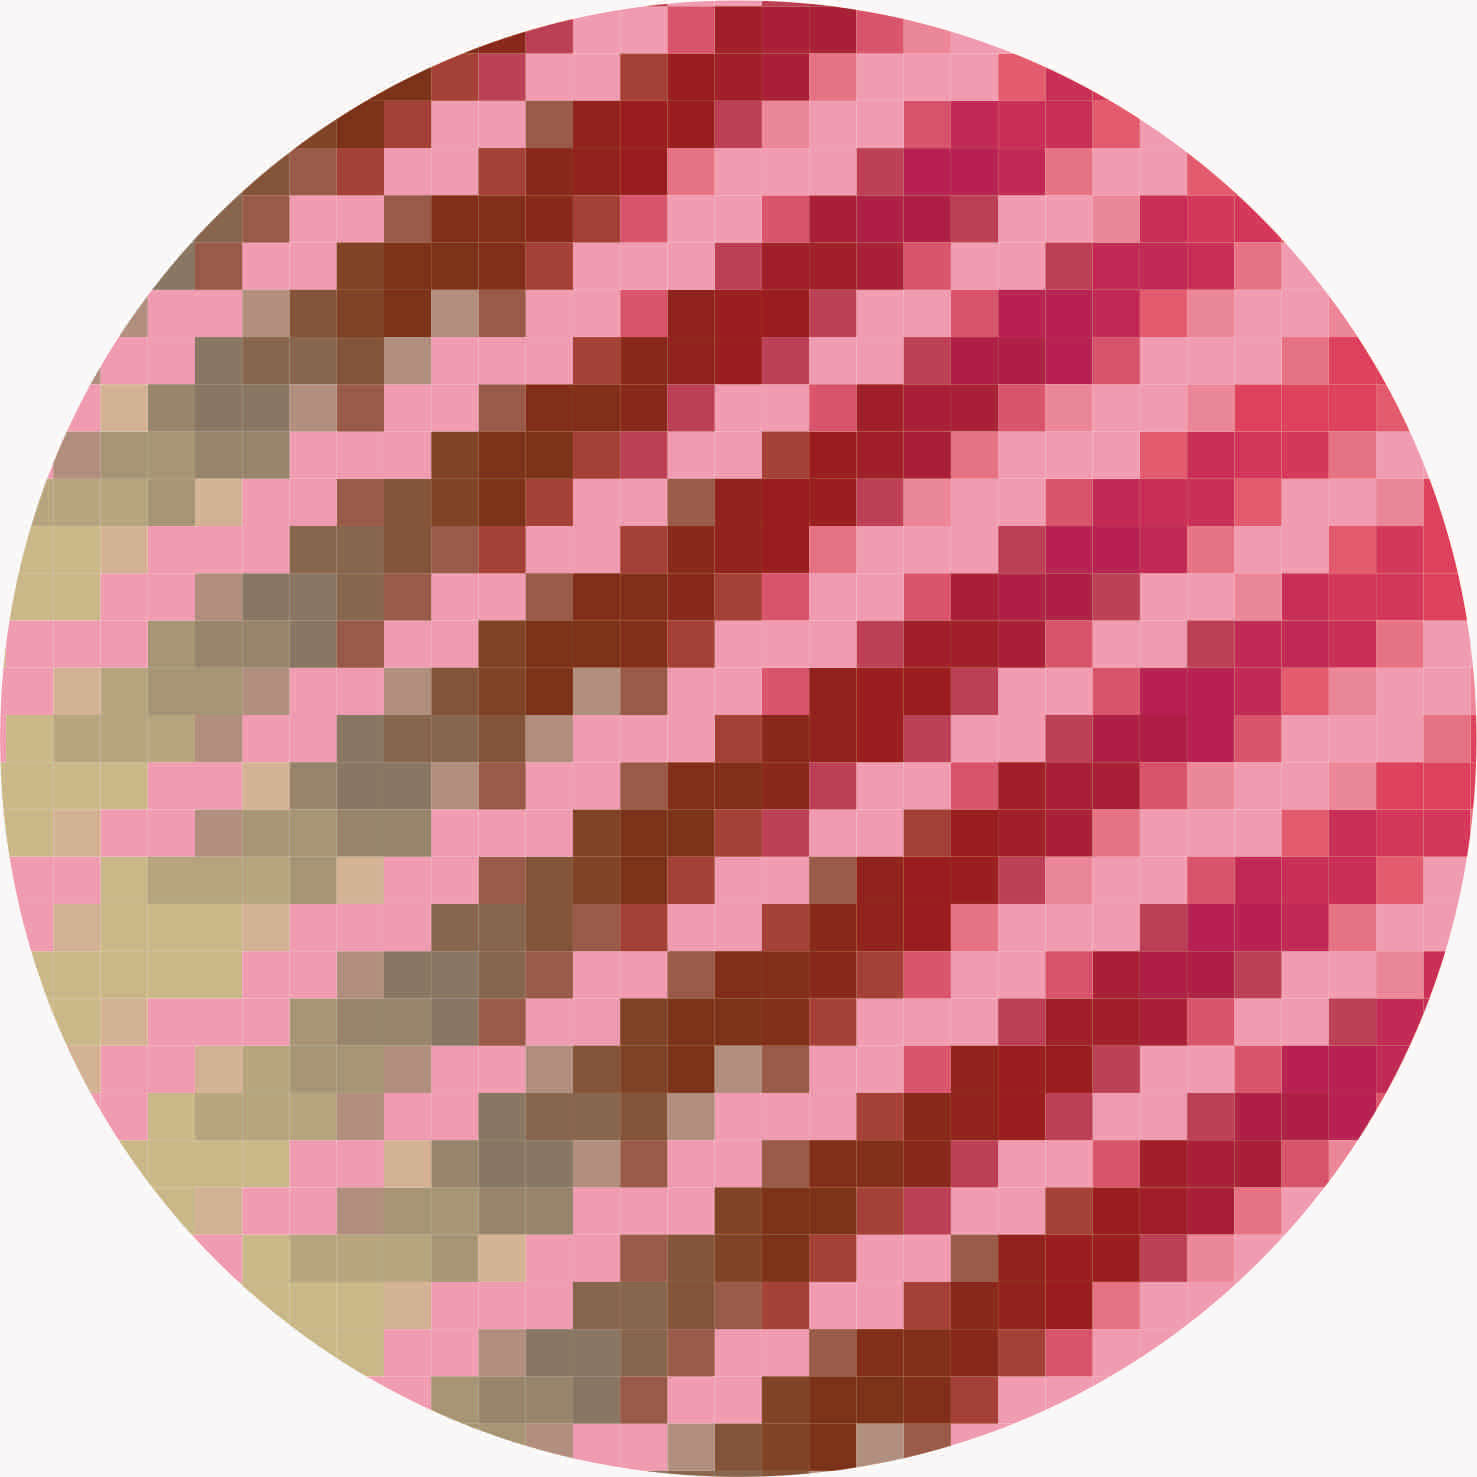 16 | Pixel - Hadden Daley